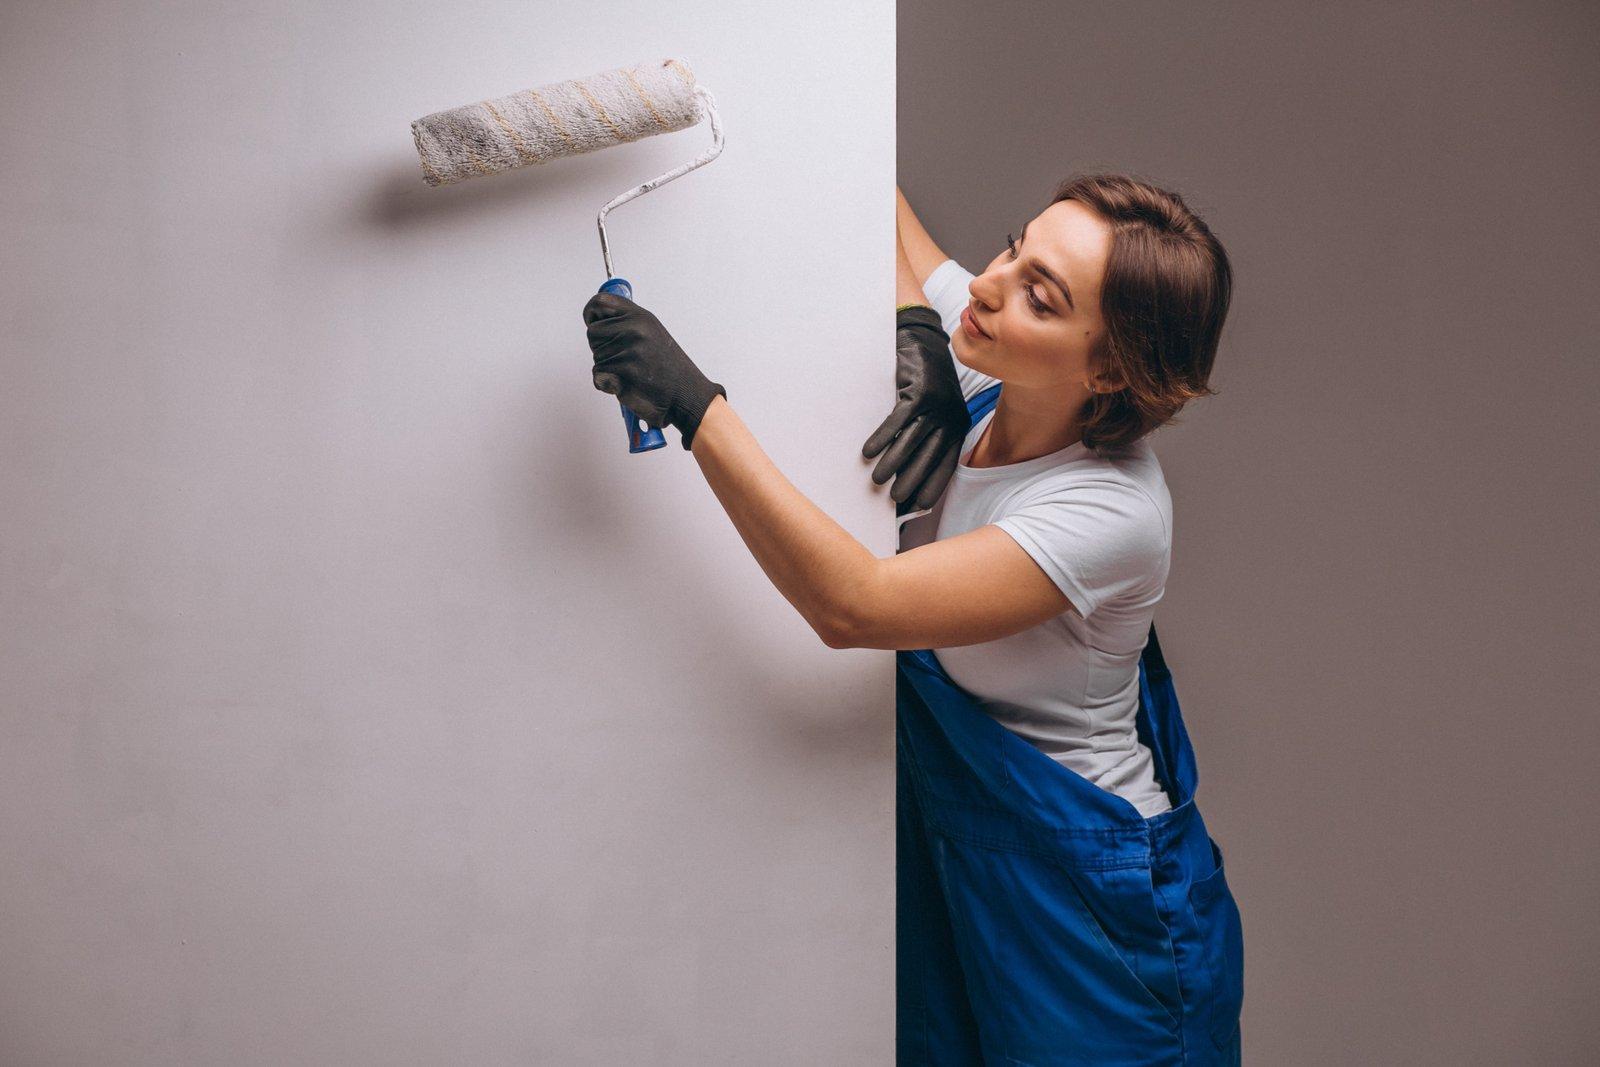 Como preparar a parede para receber a pintura - Lojas Alves